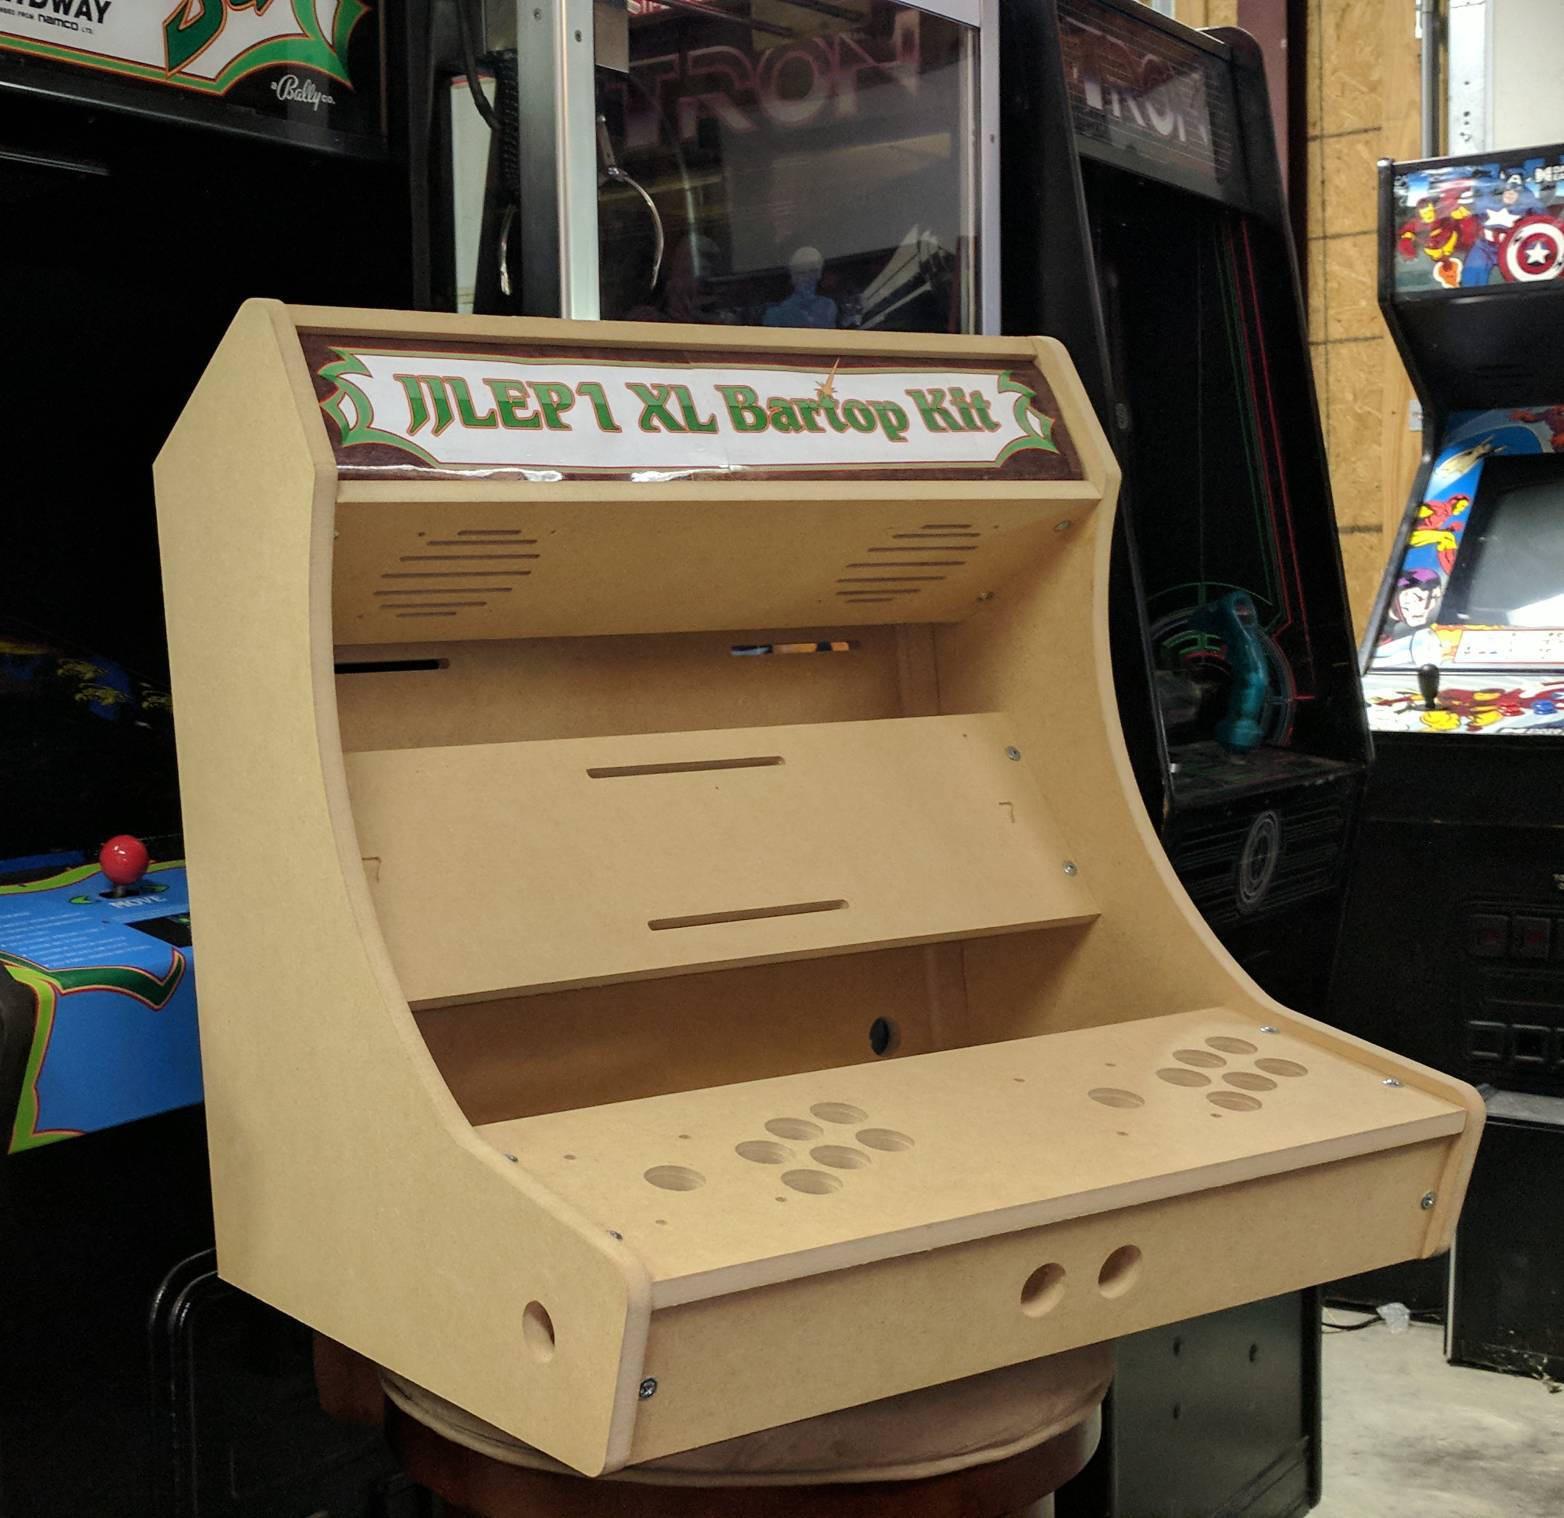 DIY Arcade Cabinet Kits  2 Player XL bartop tabletop arcade cabinet DIY kit w